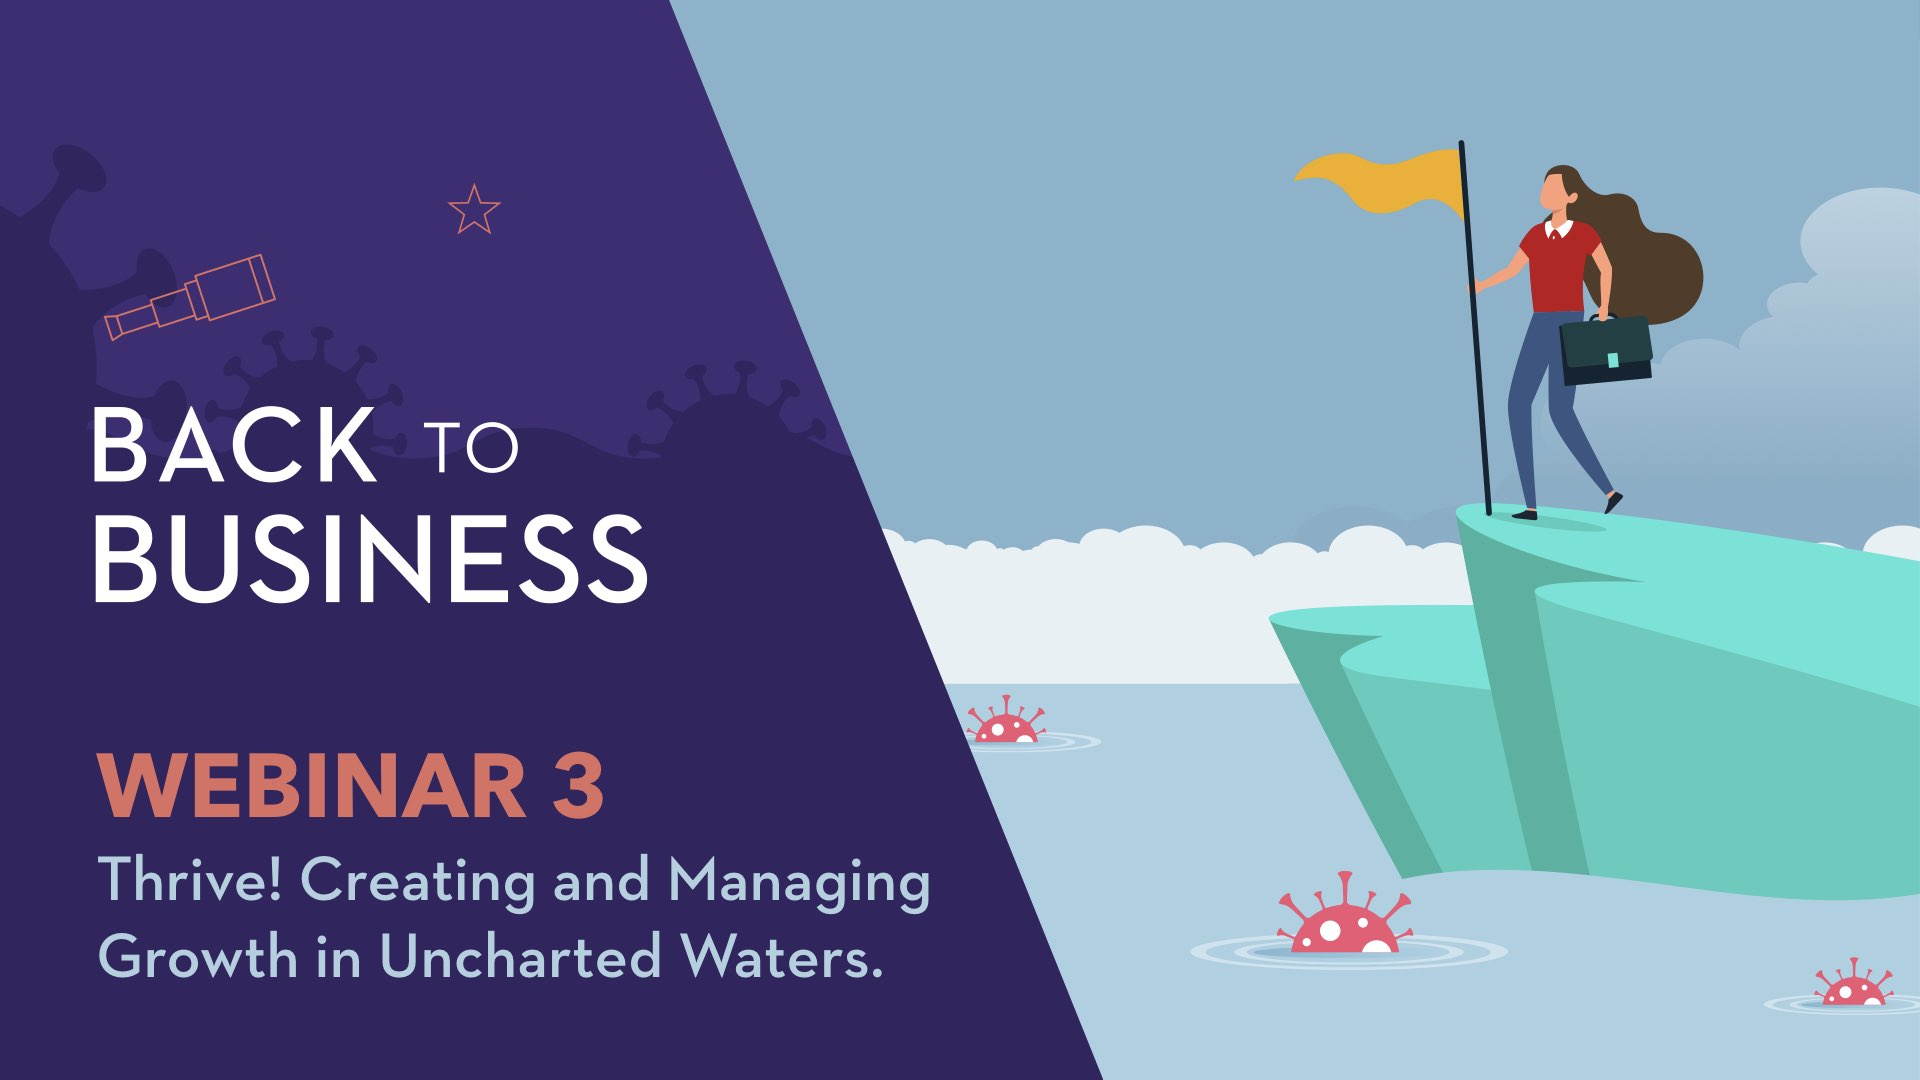 Back To Business Webinar 3